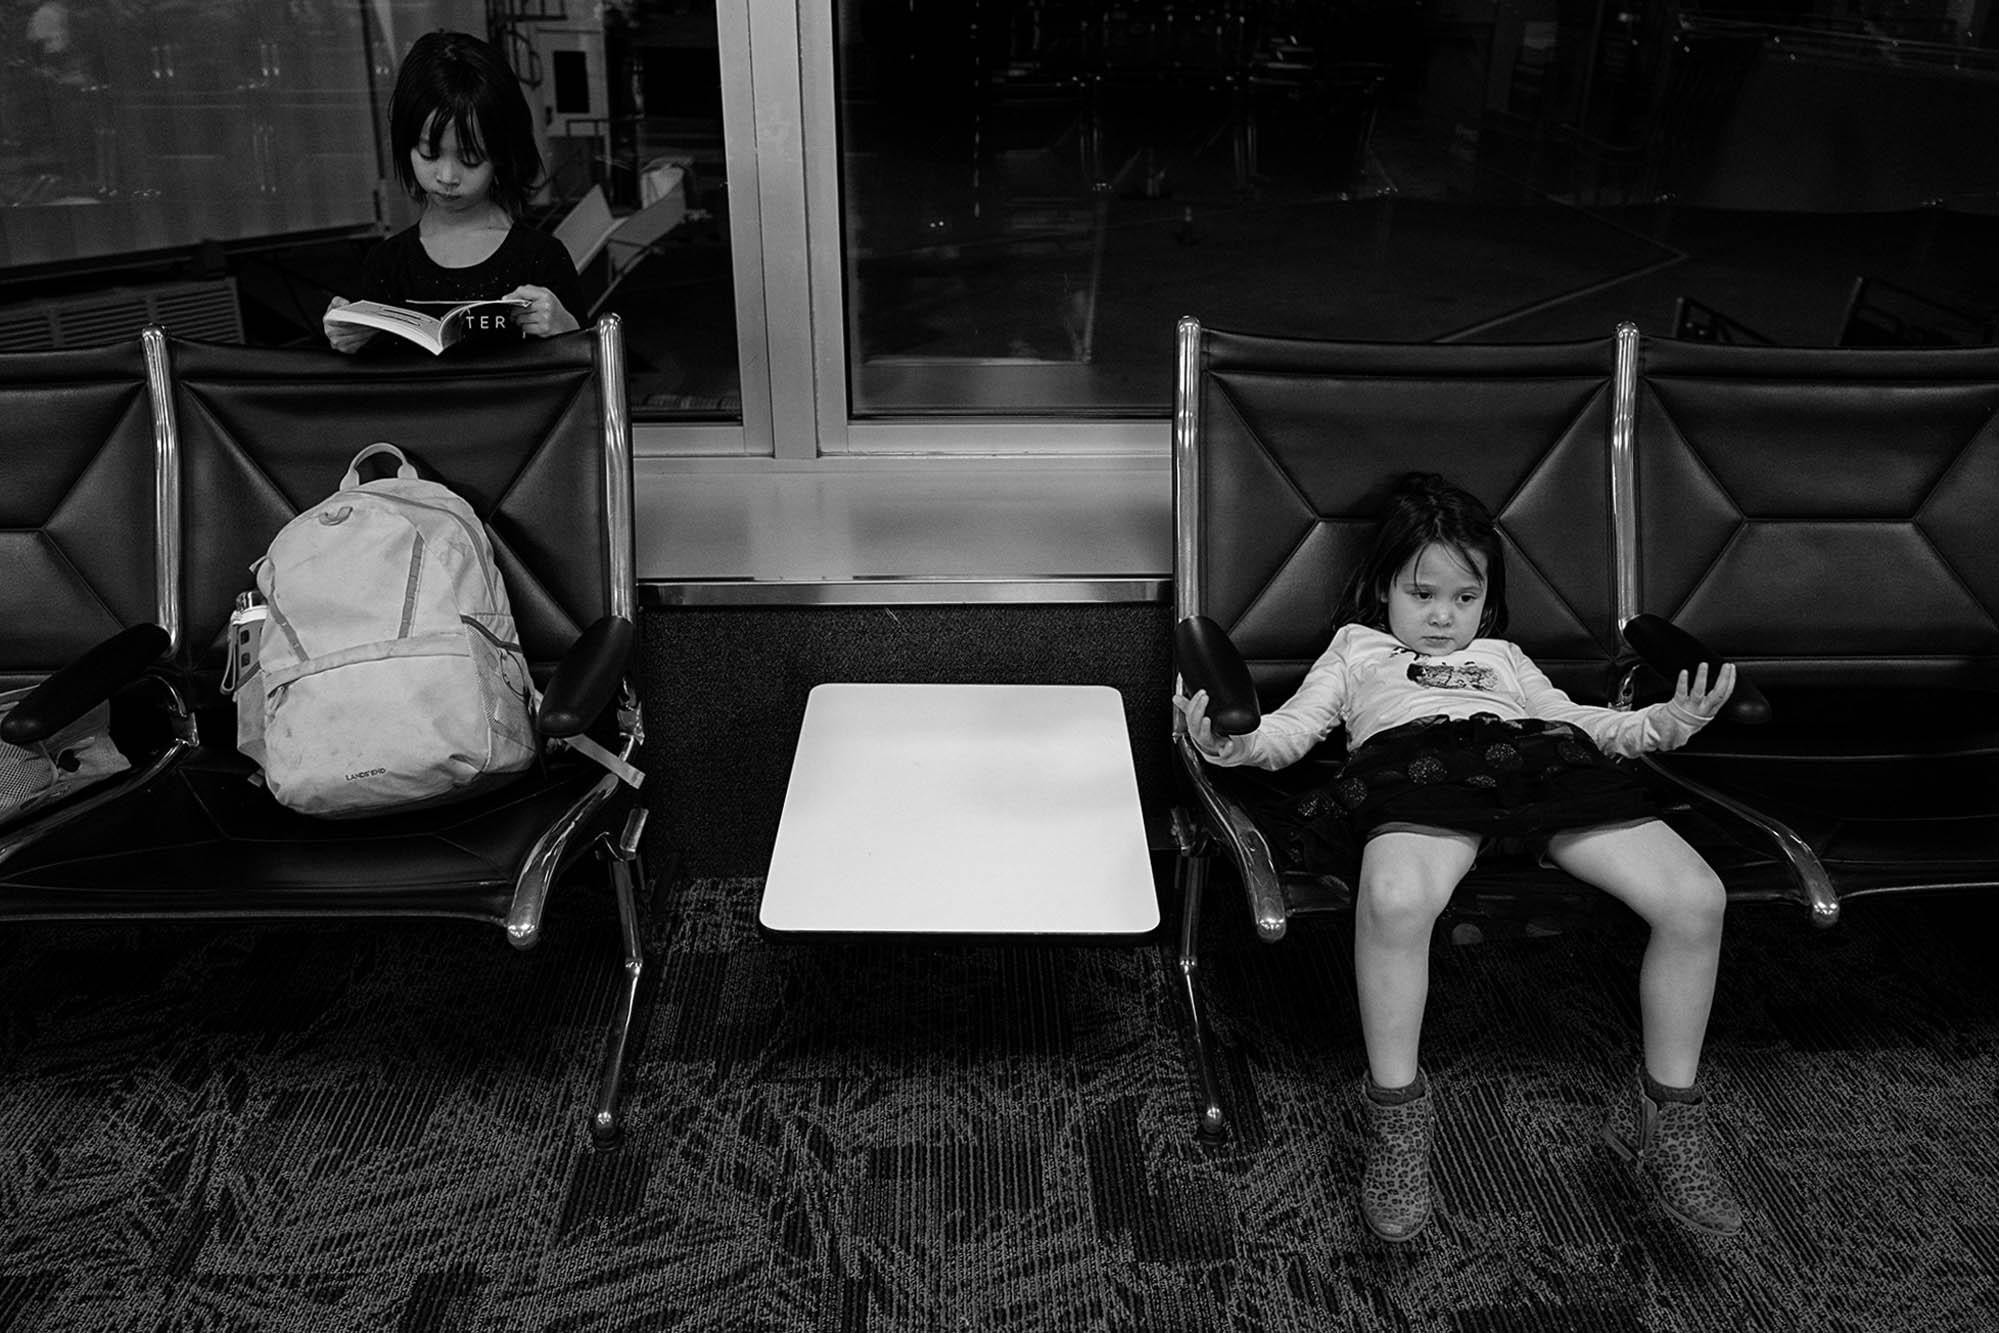 girls waiting in airport